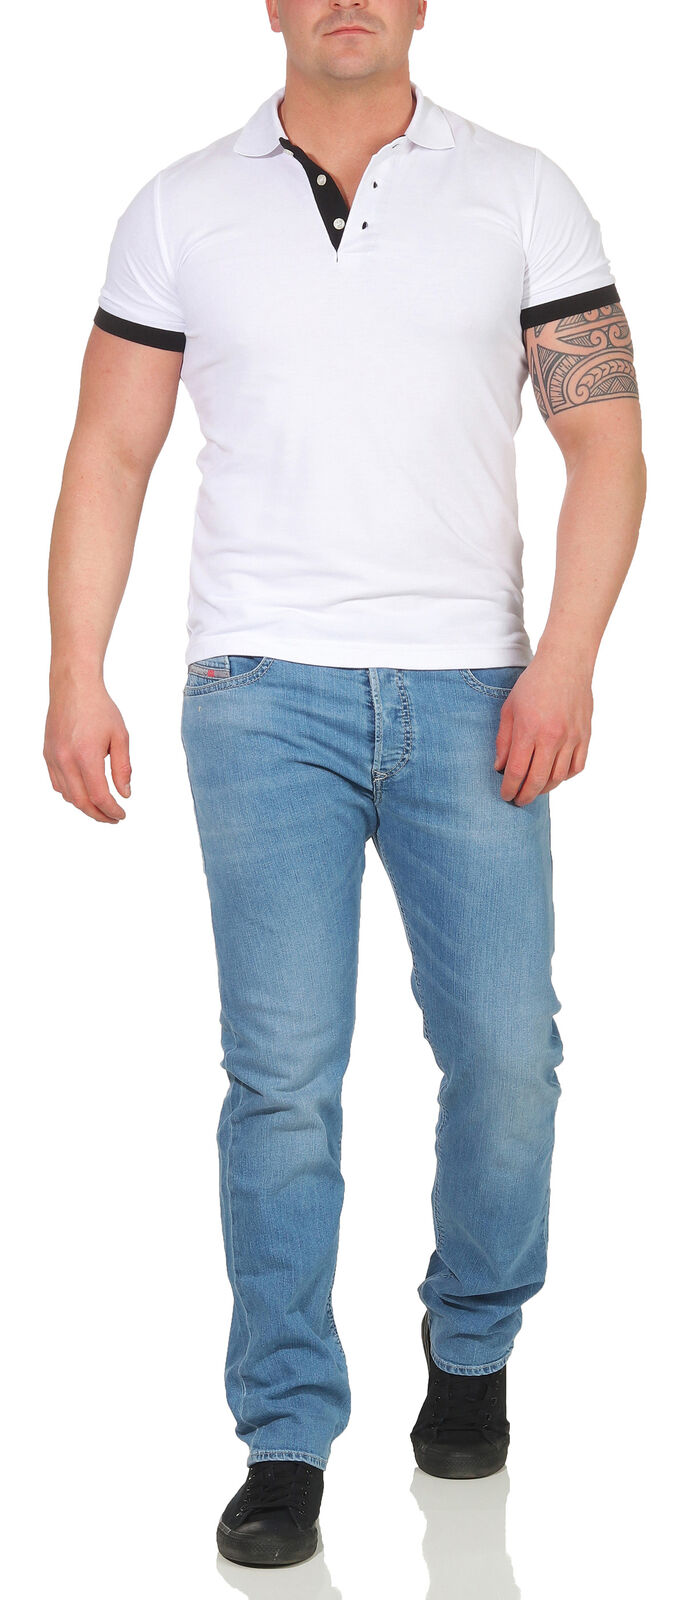 JEANS Diesel Uomo Buster Pantaloni Regular Slim Slim Slim Tapered Pantaloni Jeans Look Usato PANT 6e2e9b